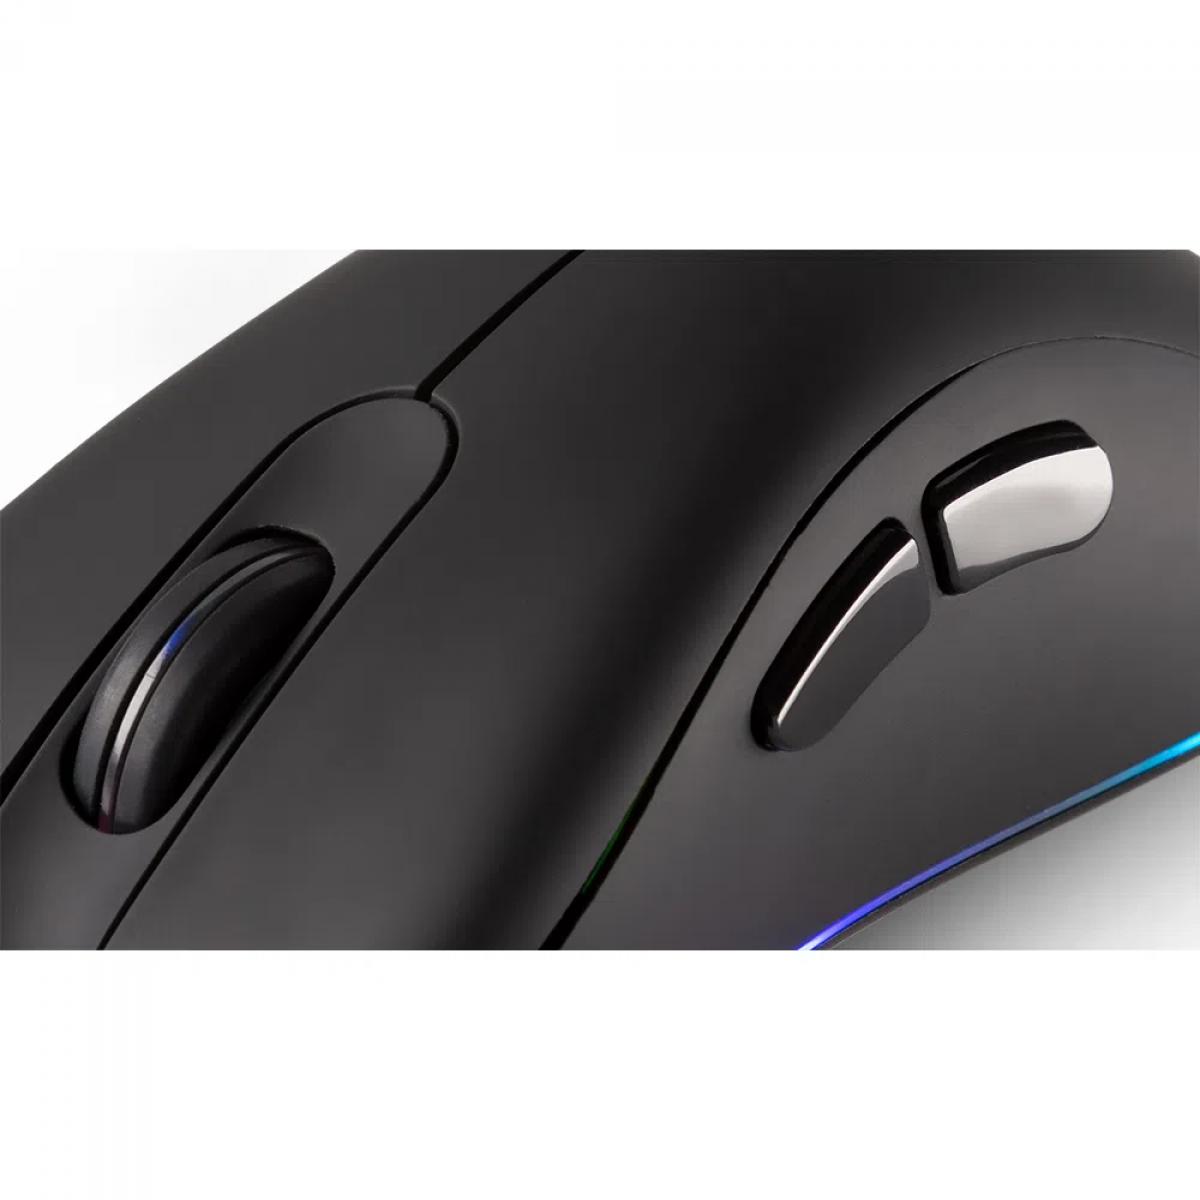 Mouse Gamer Dazz FPS Series, 12000 DPI, RGB, 2 Botões Programáveis, Black